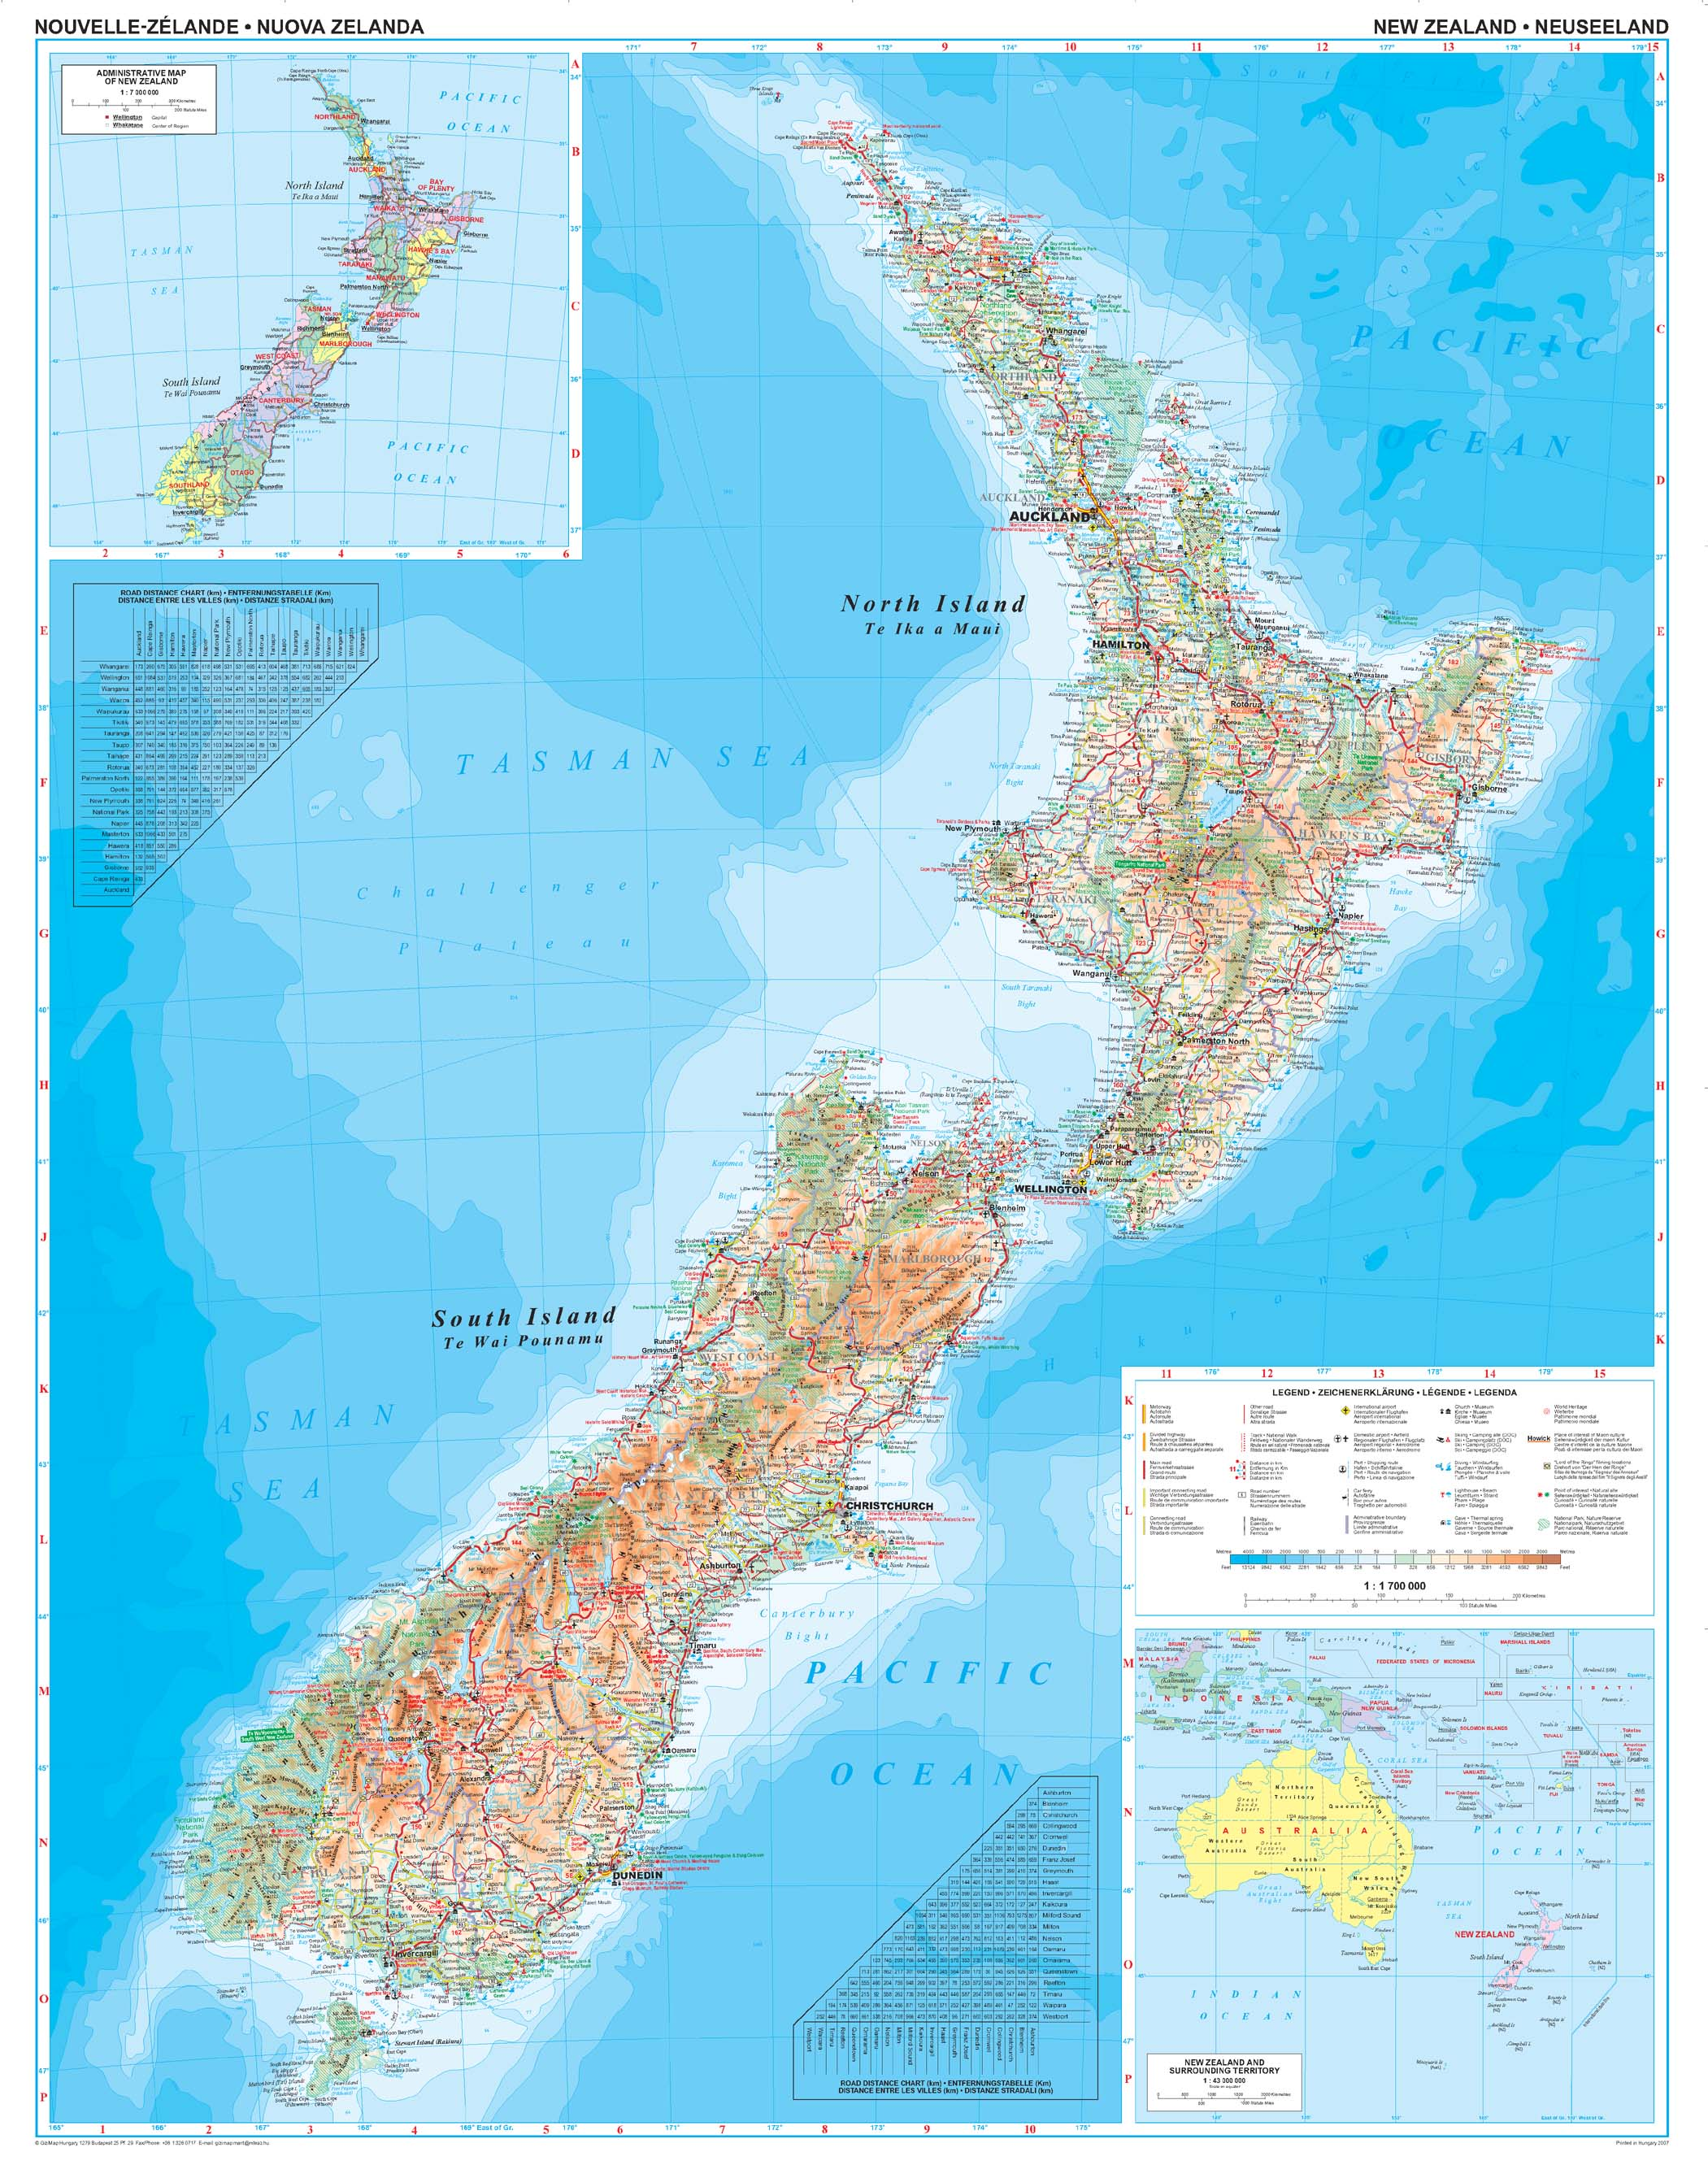 neuseeland landkarte Neuseeland Landkarte physikalisch 74 x 94cm   Ozeanien  neuseeland landkarte